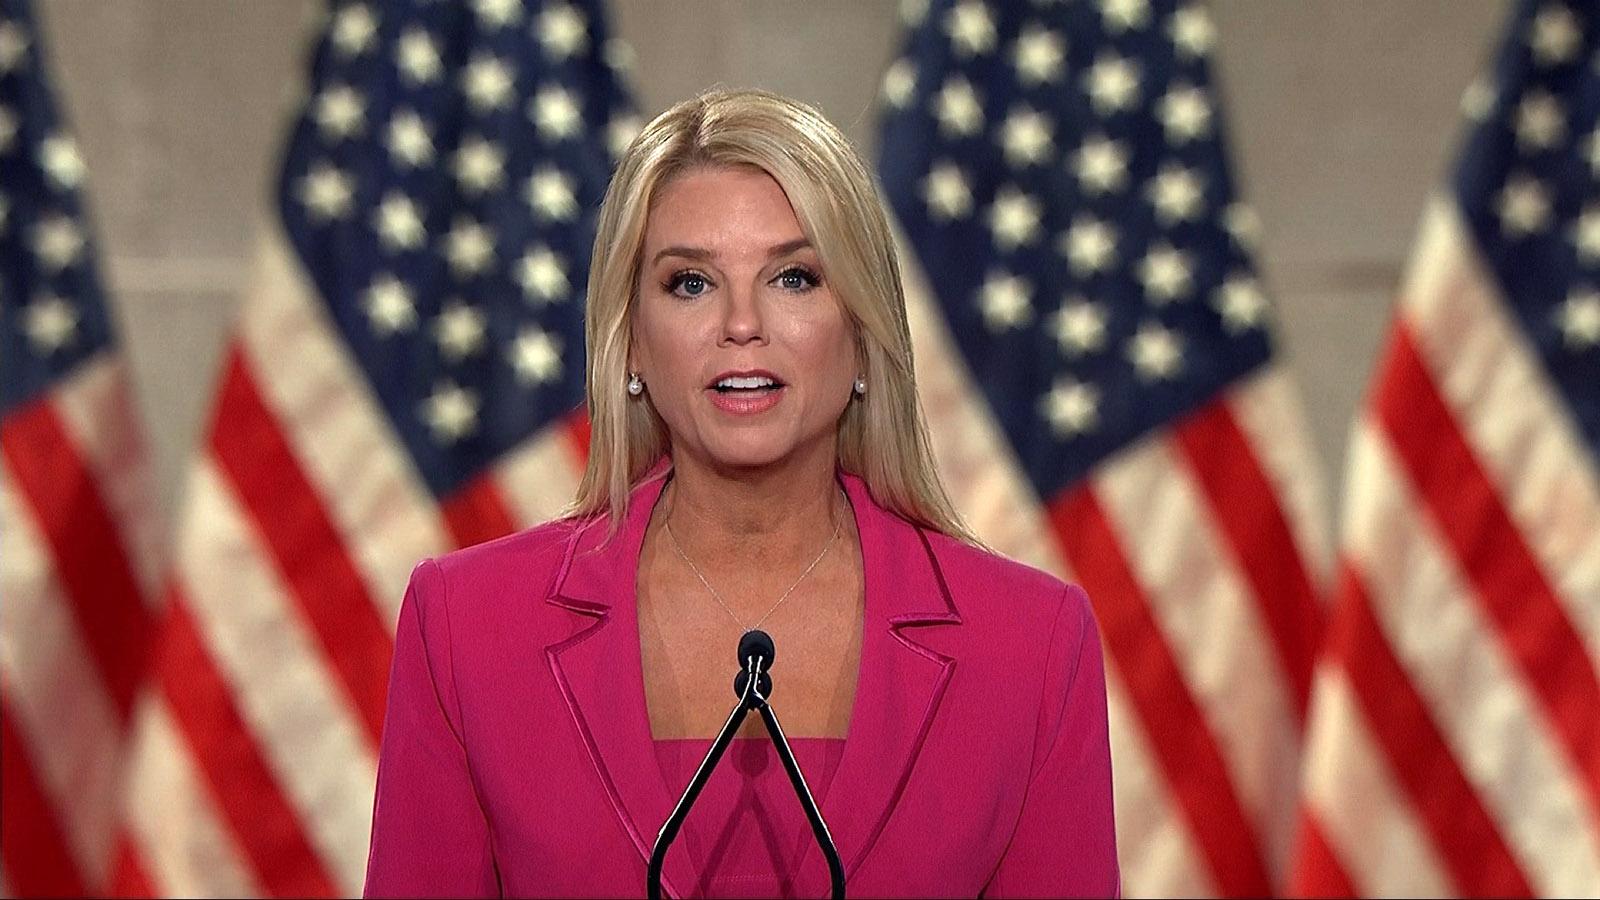 Former Florida Attorney General Pam Bondi.